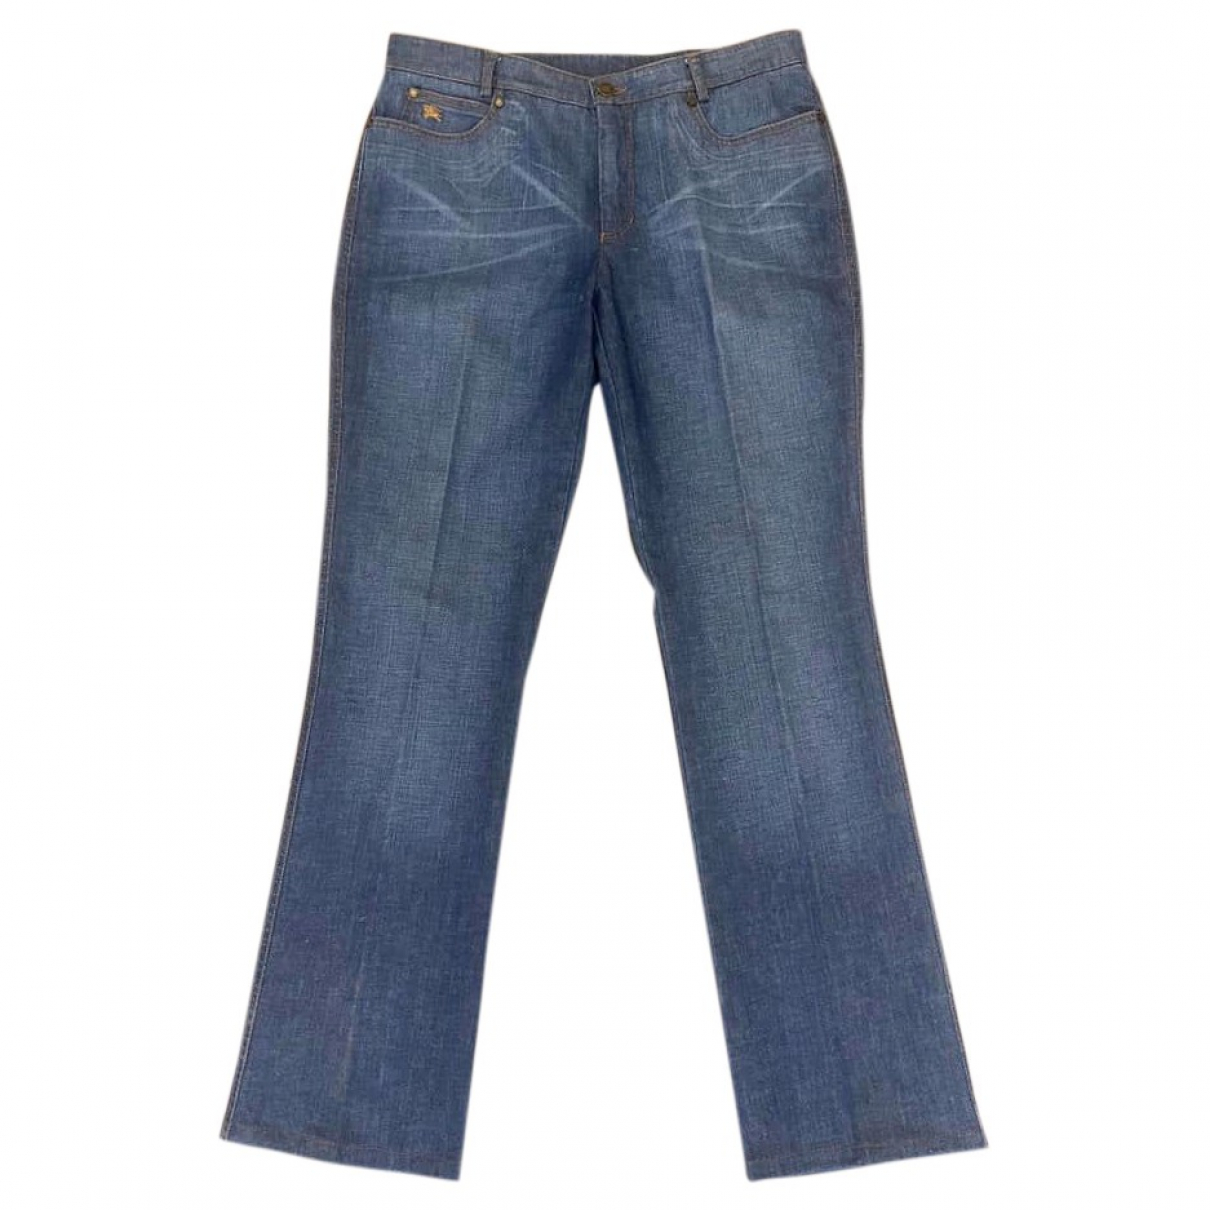 Burberry \N Blue Cotton - elasthane Jeans for Women 44 FR